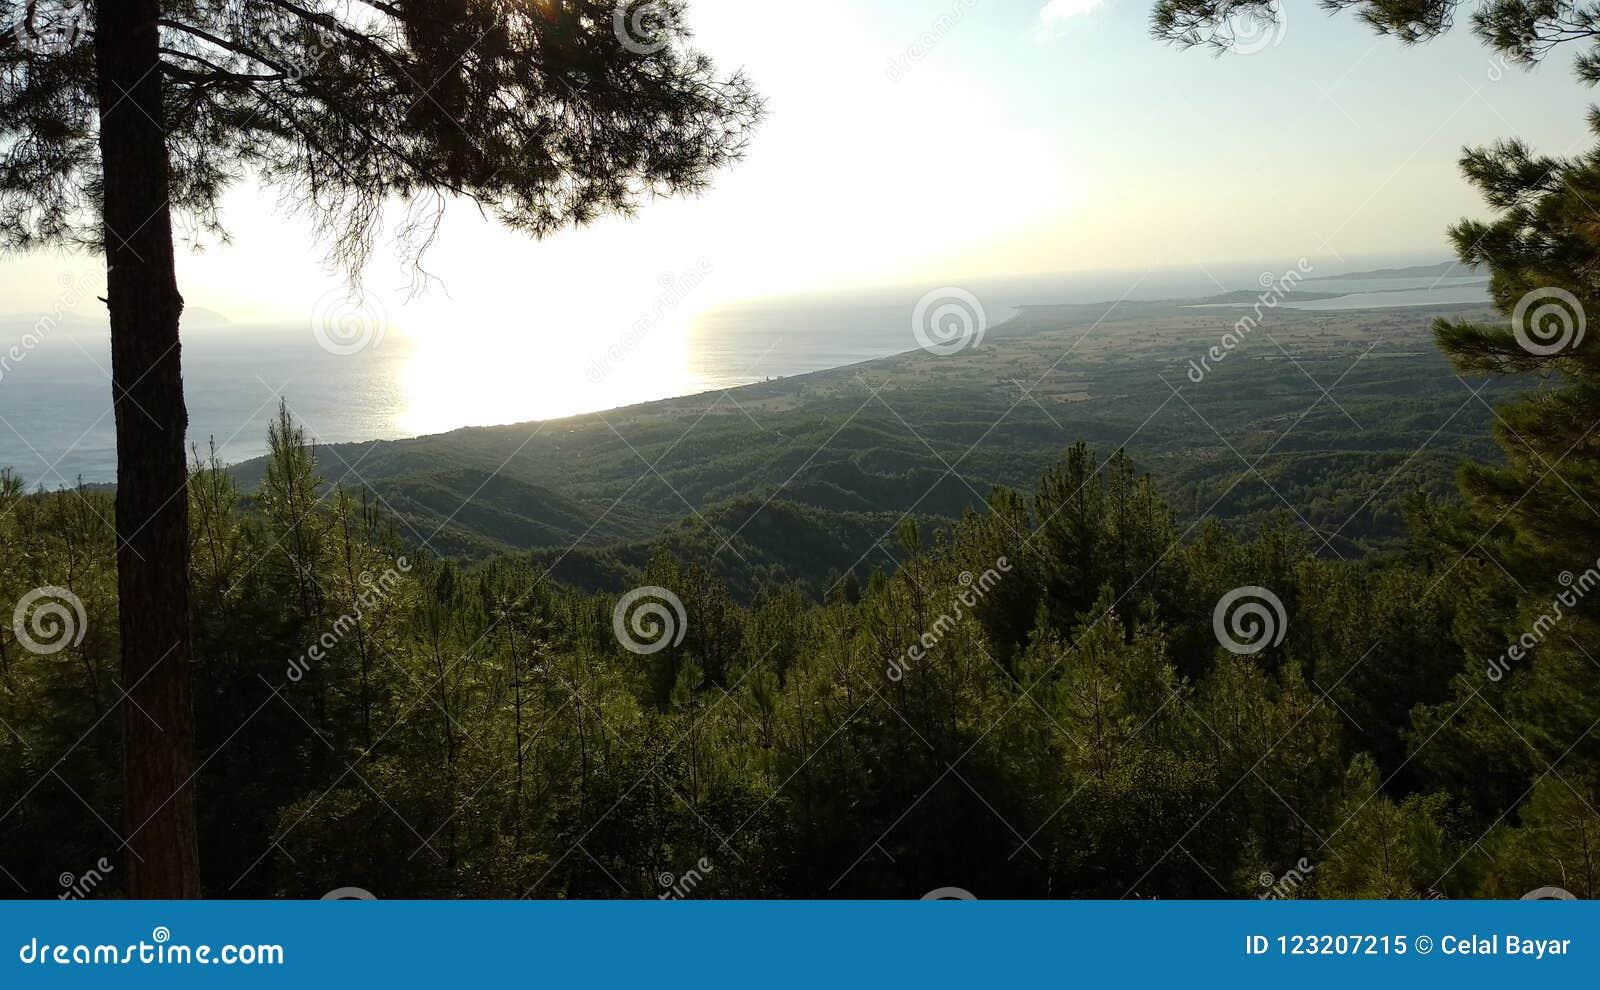 Download Canakkale sea coast beach stock image. Image of fruit - 123207215